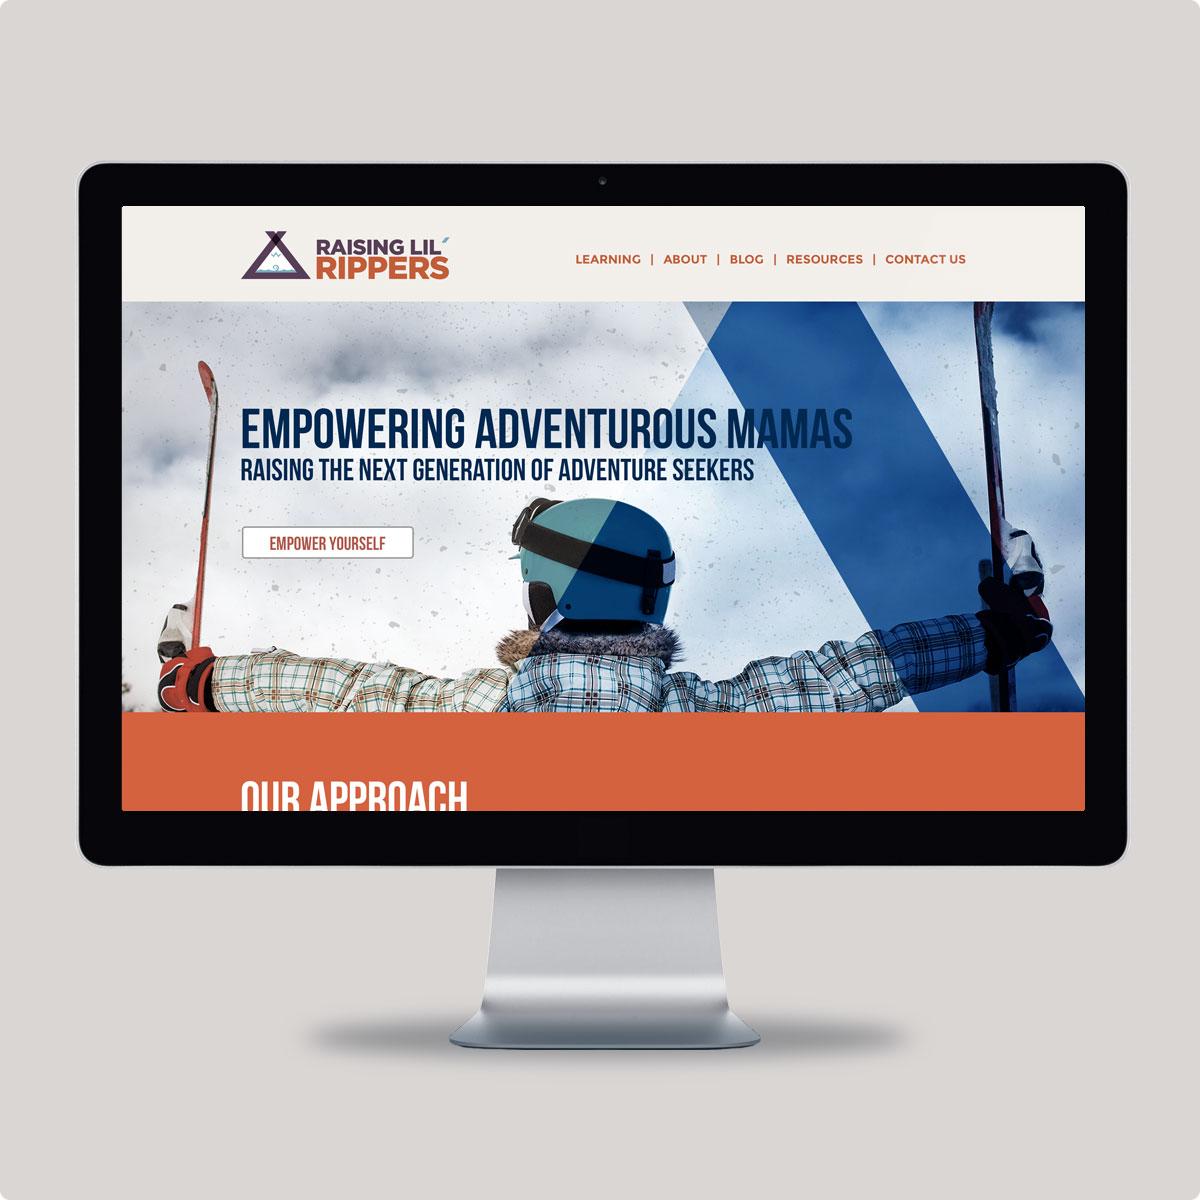 RLR-web-portfolio-thumbs.jpg